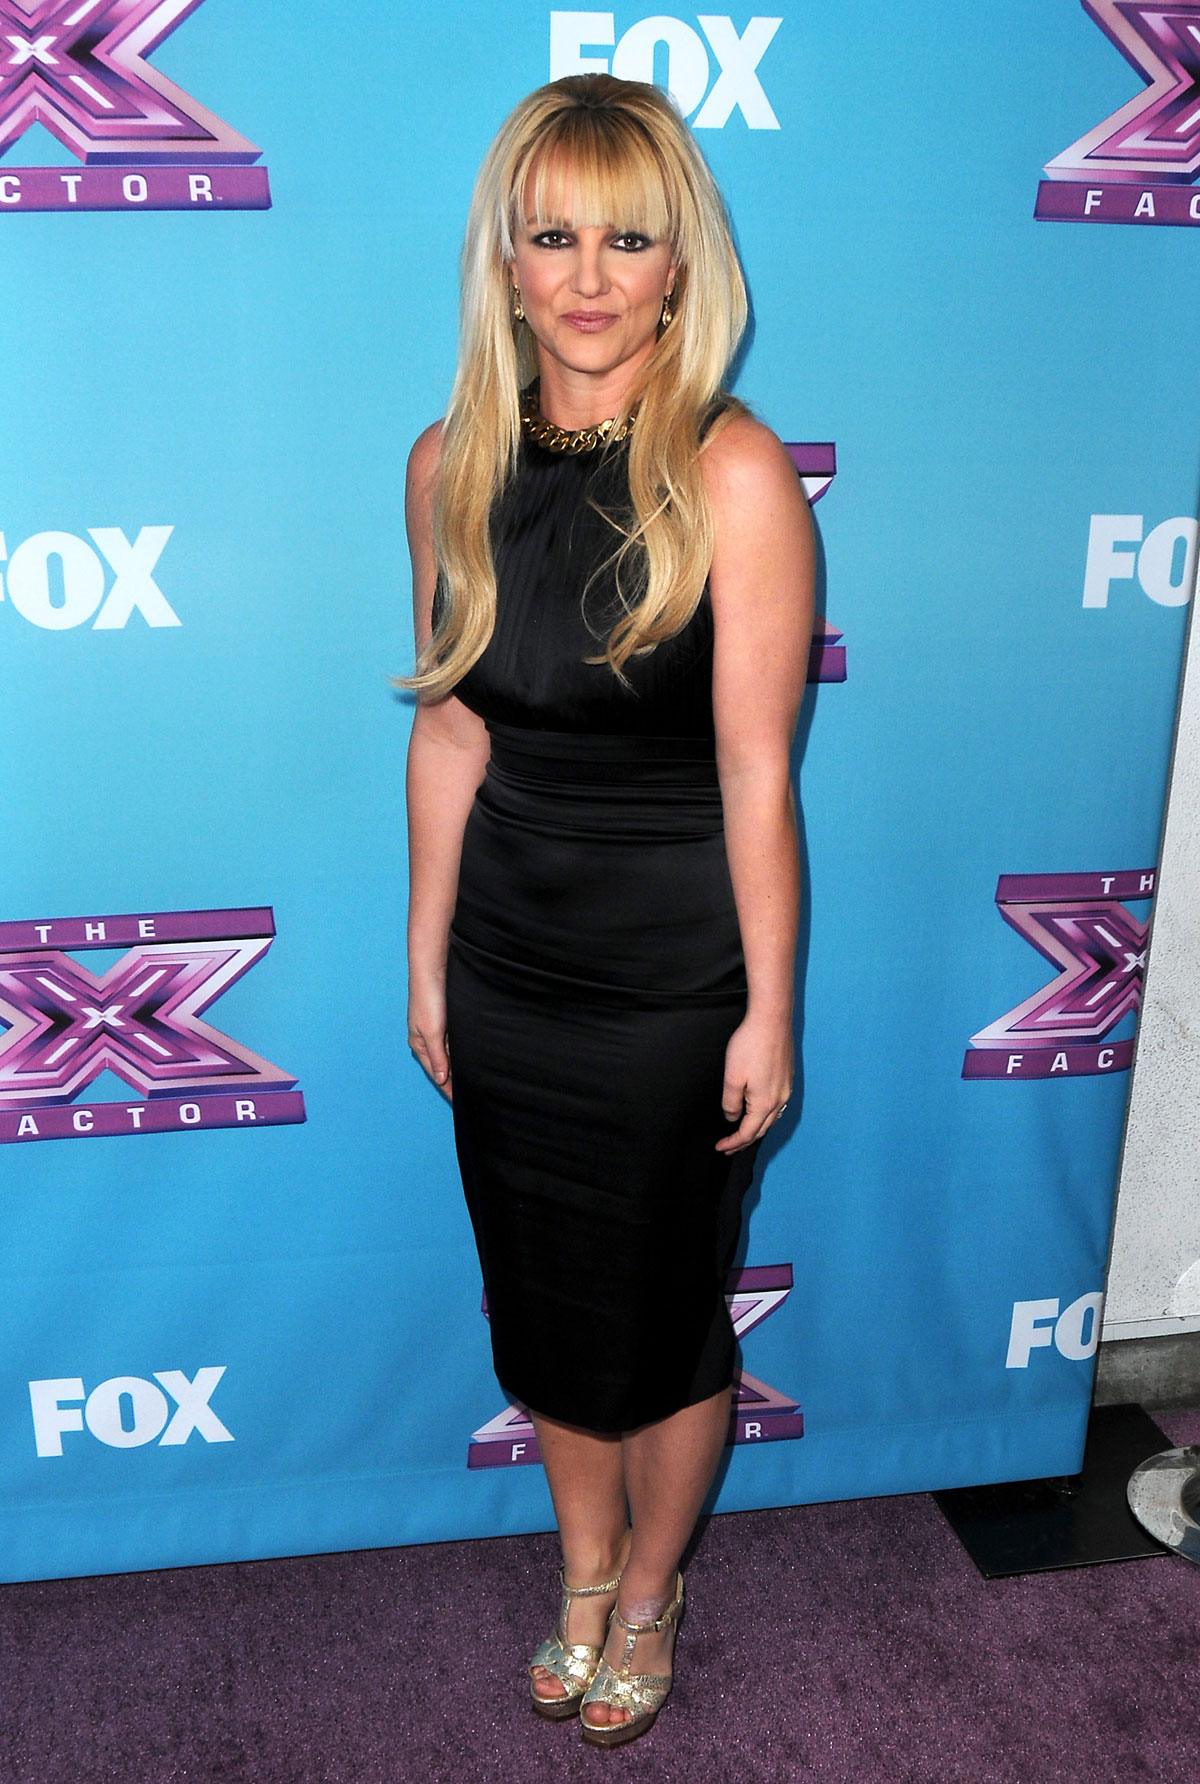 BRITNEY SPEARS at The X Factor Season Finale Night 1 in Los Angeles - HawtCelebs